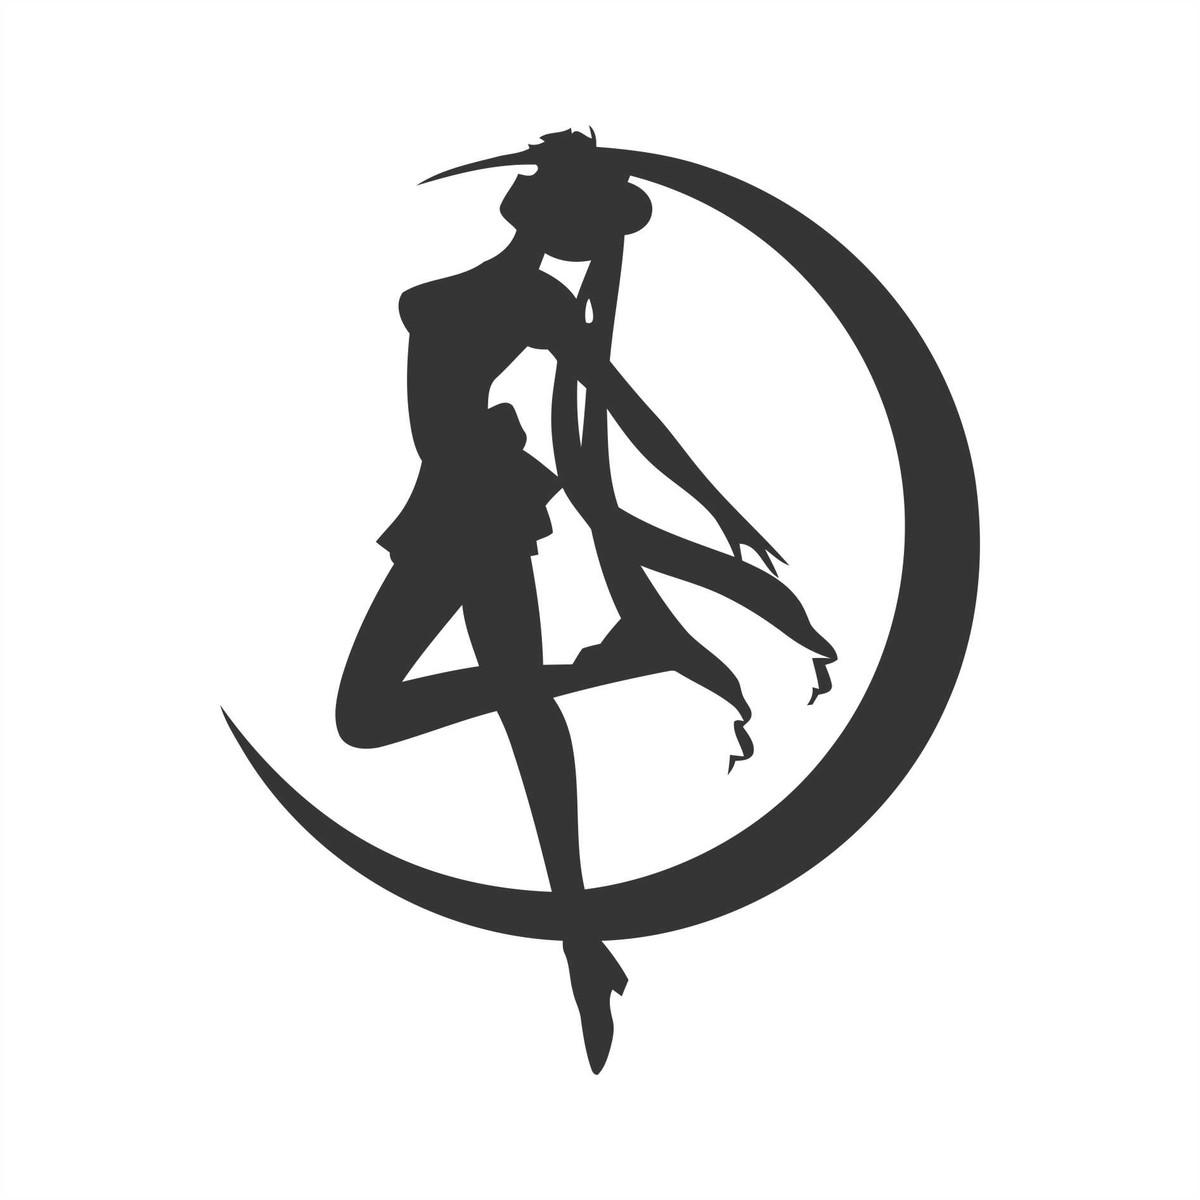 Adesivo Sailor Moon No Elo7 Queen Ind 218 Stria De Adesivos